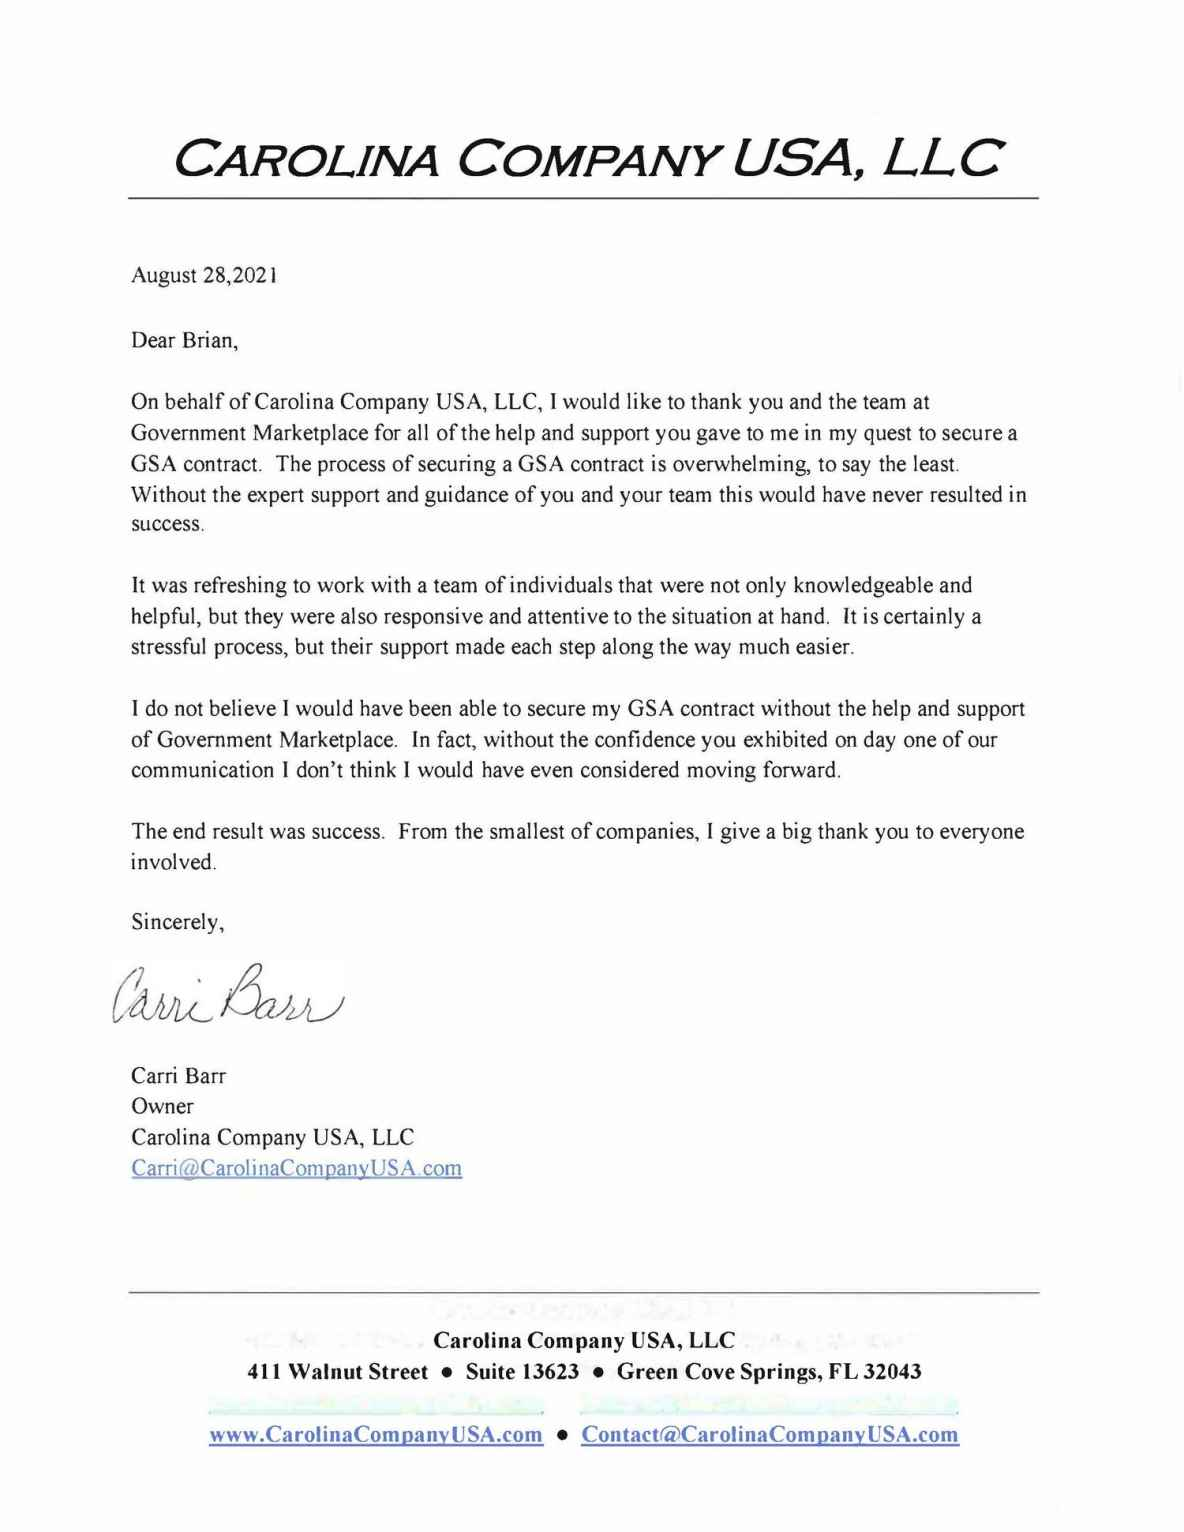 Carolina Company USA, LLC